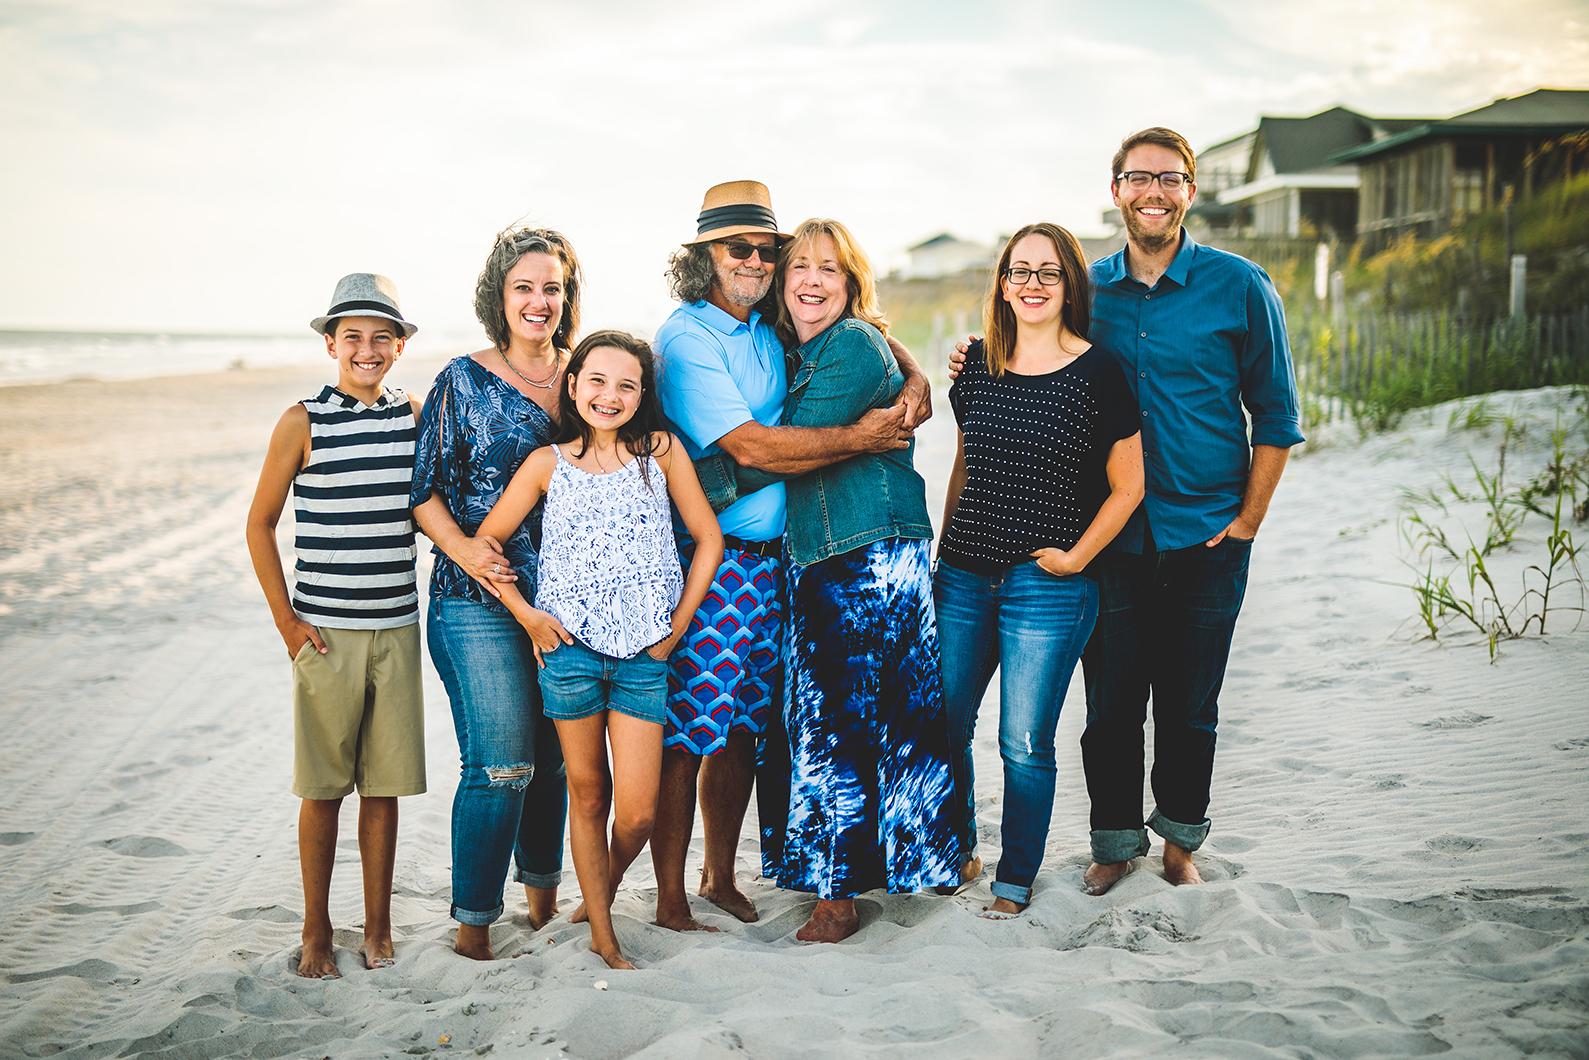 Topsail Beach Family portrait